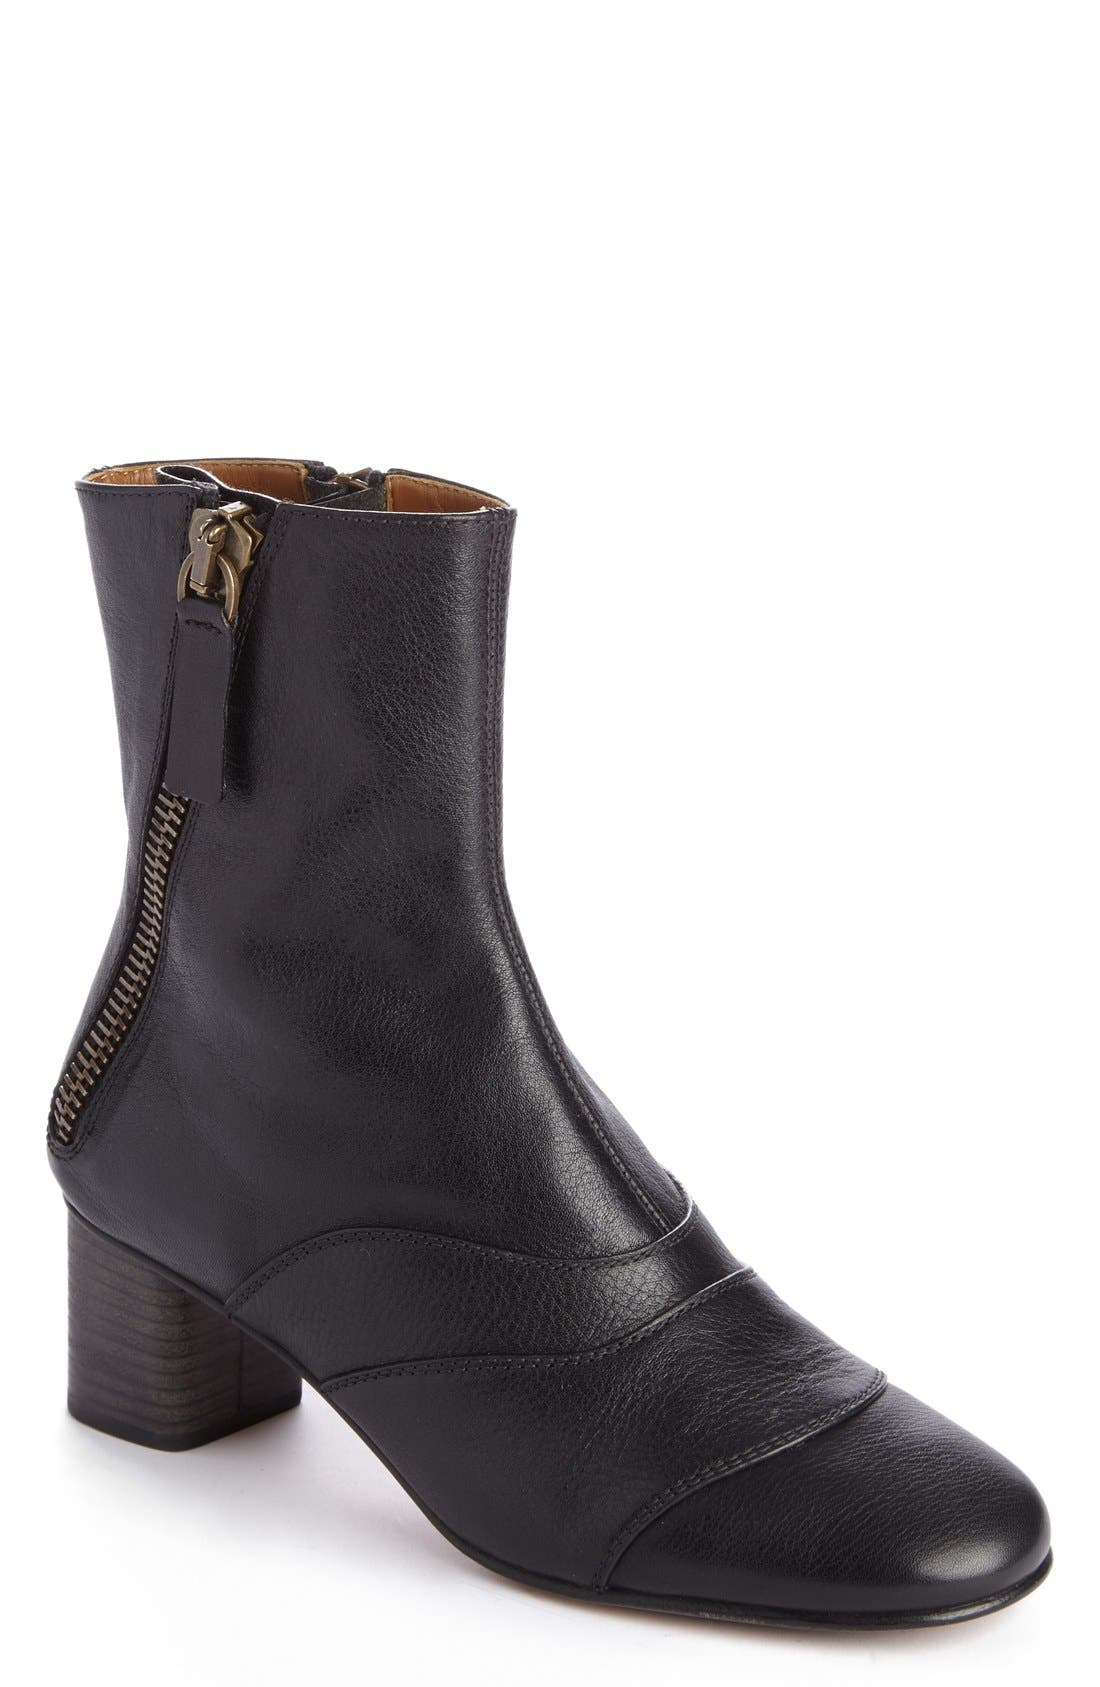 'Lexie' Block Heel Boot,                             Main thumbnail 1, color,                             Black Leather